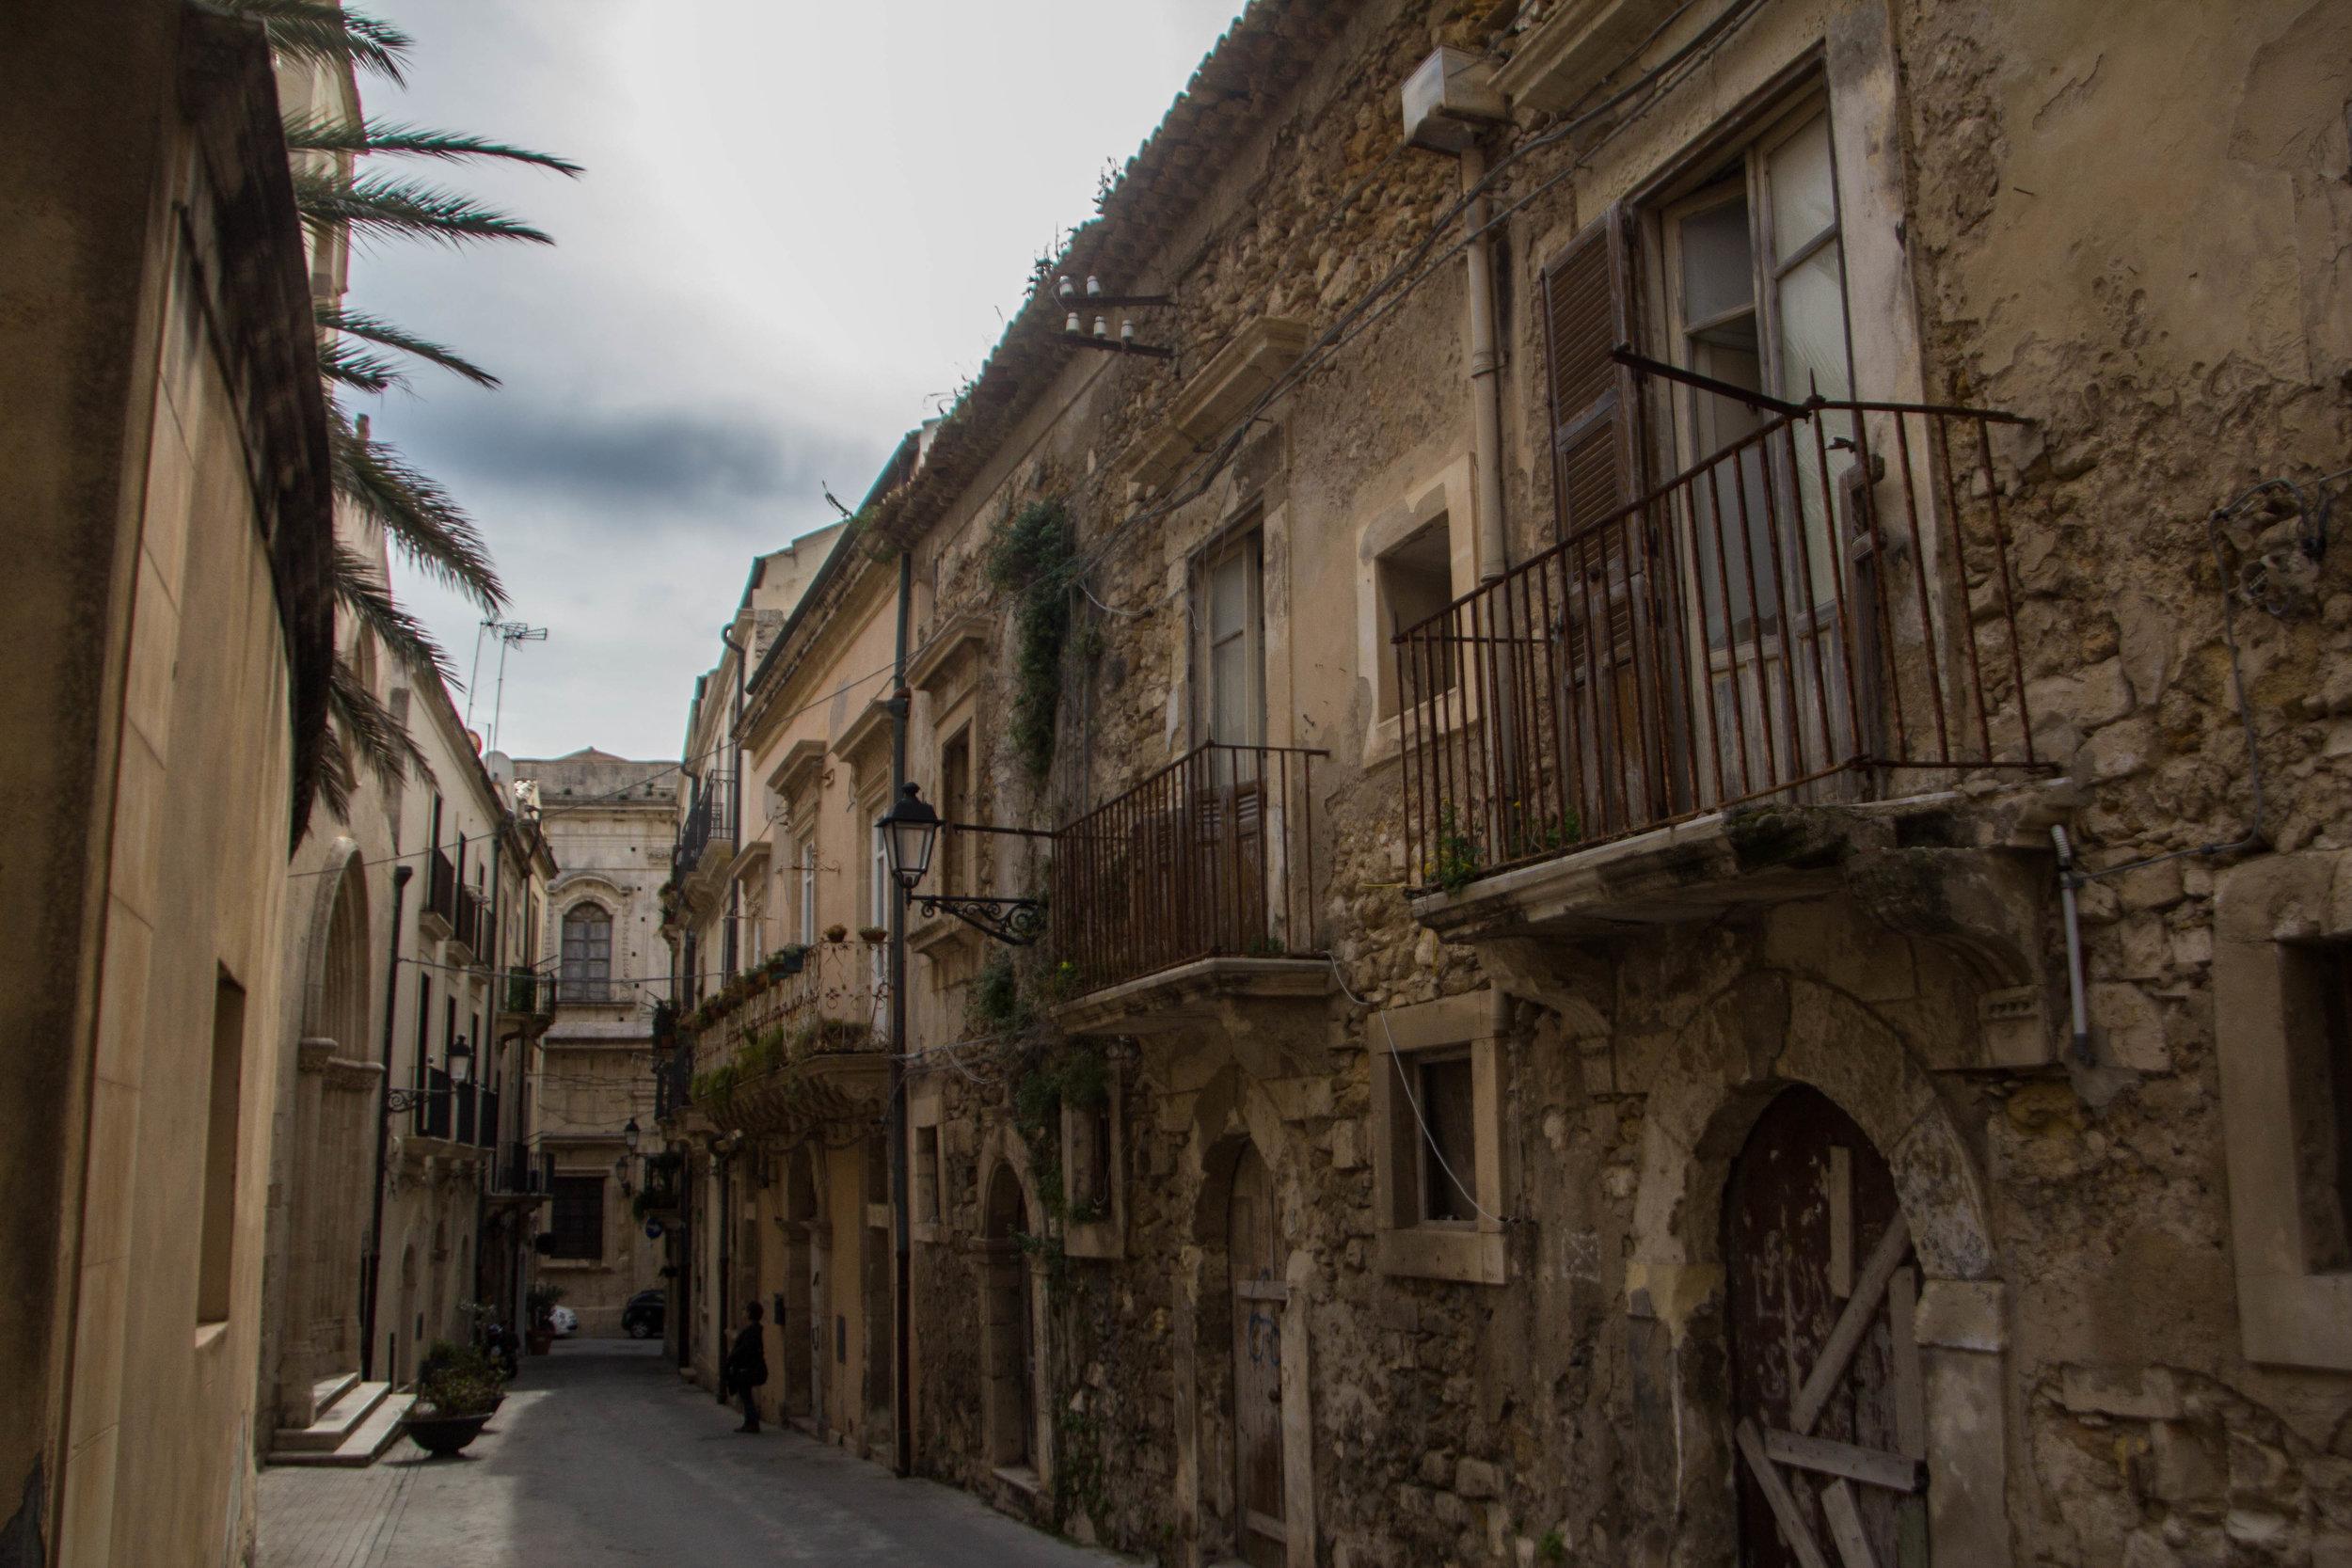 streets-ortygia-syracuse-sicily-22.jpg